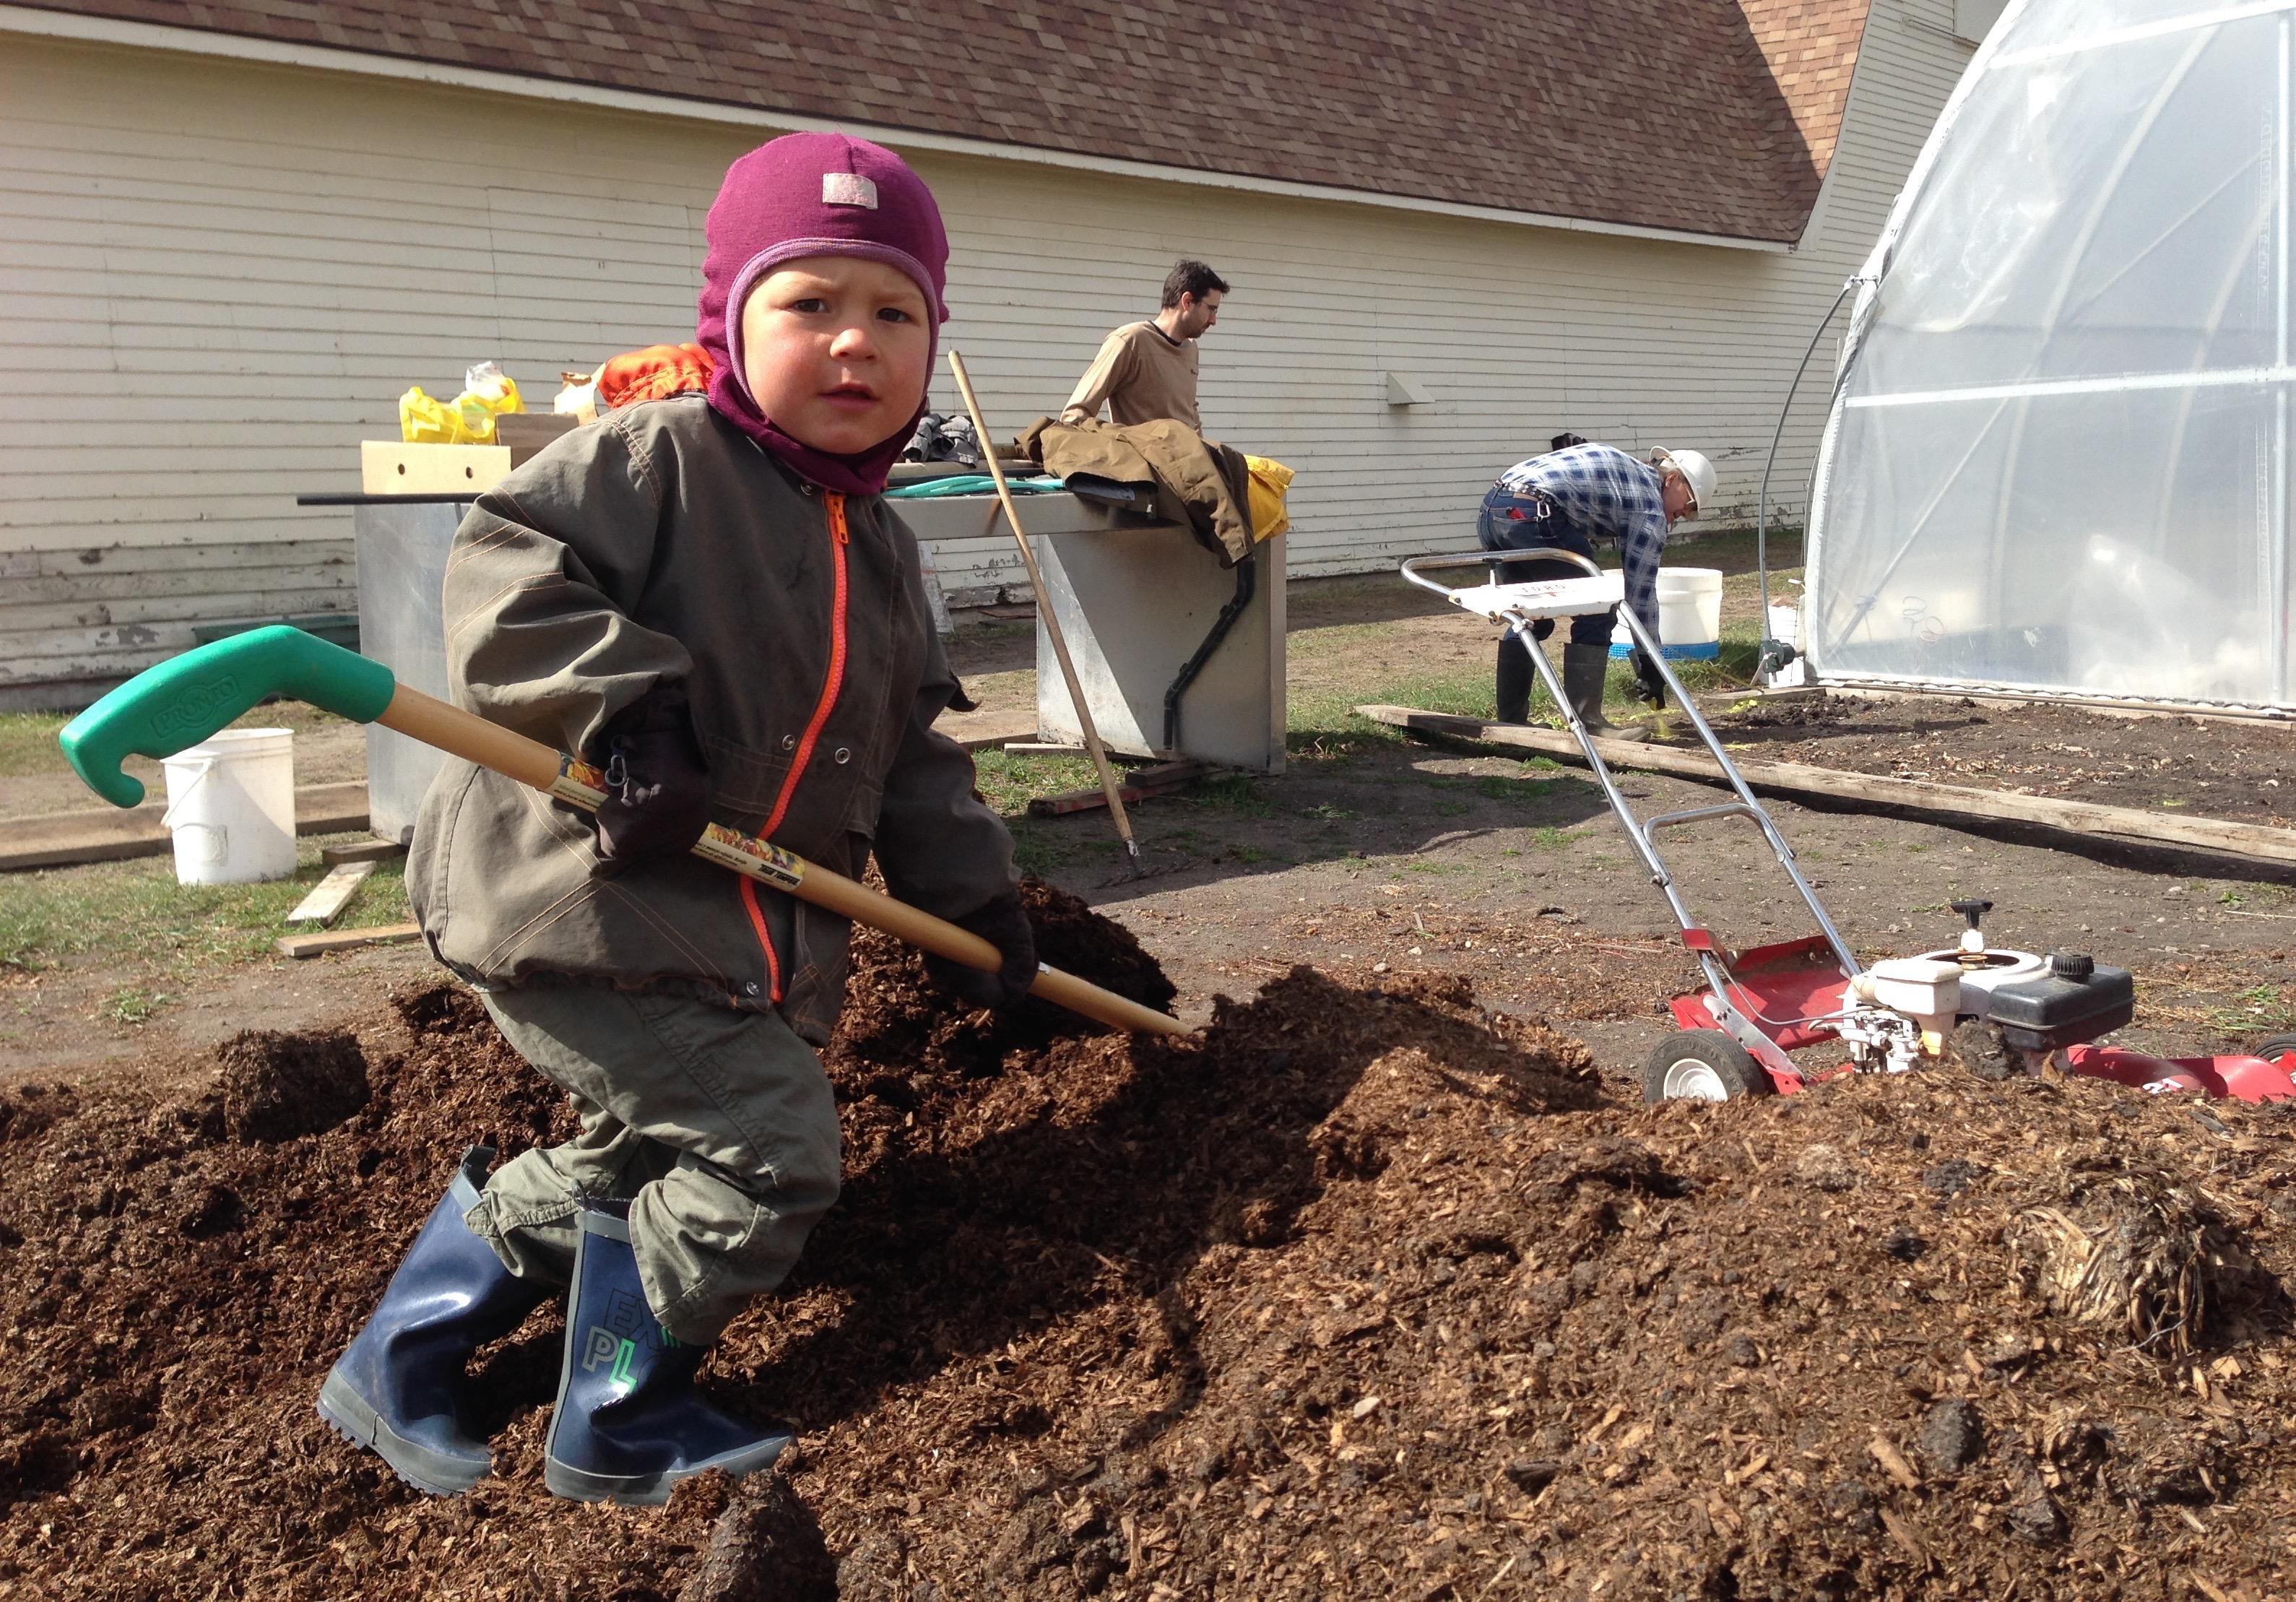 Gardener in Training